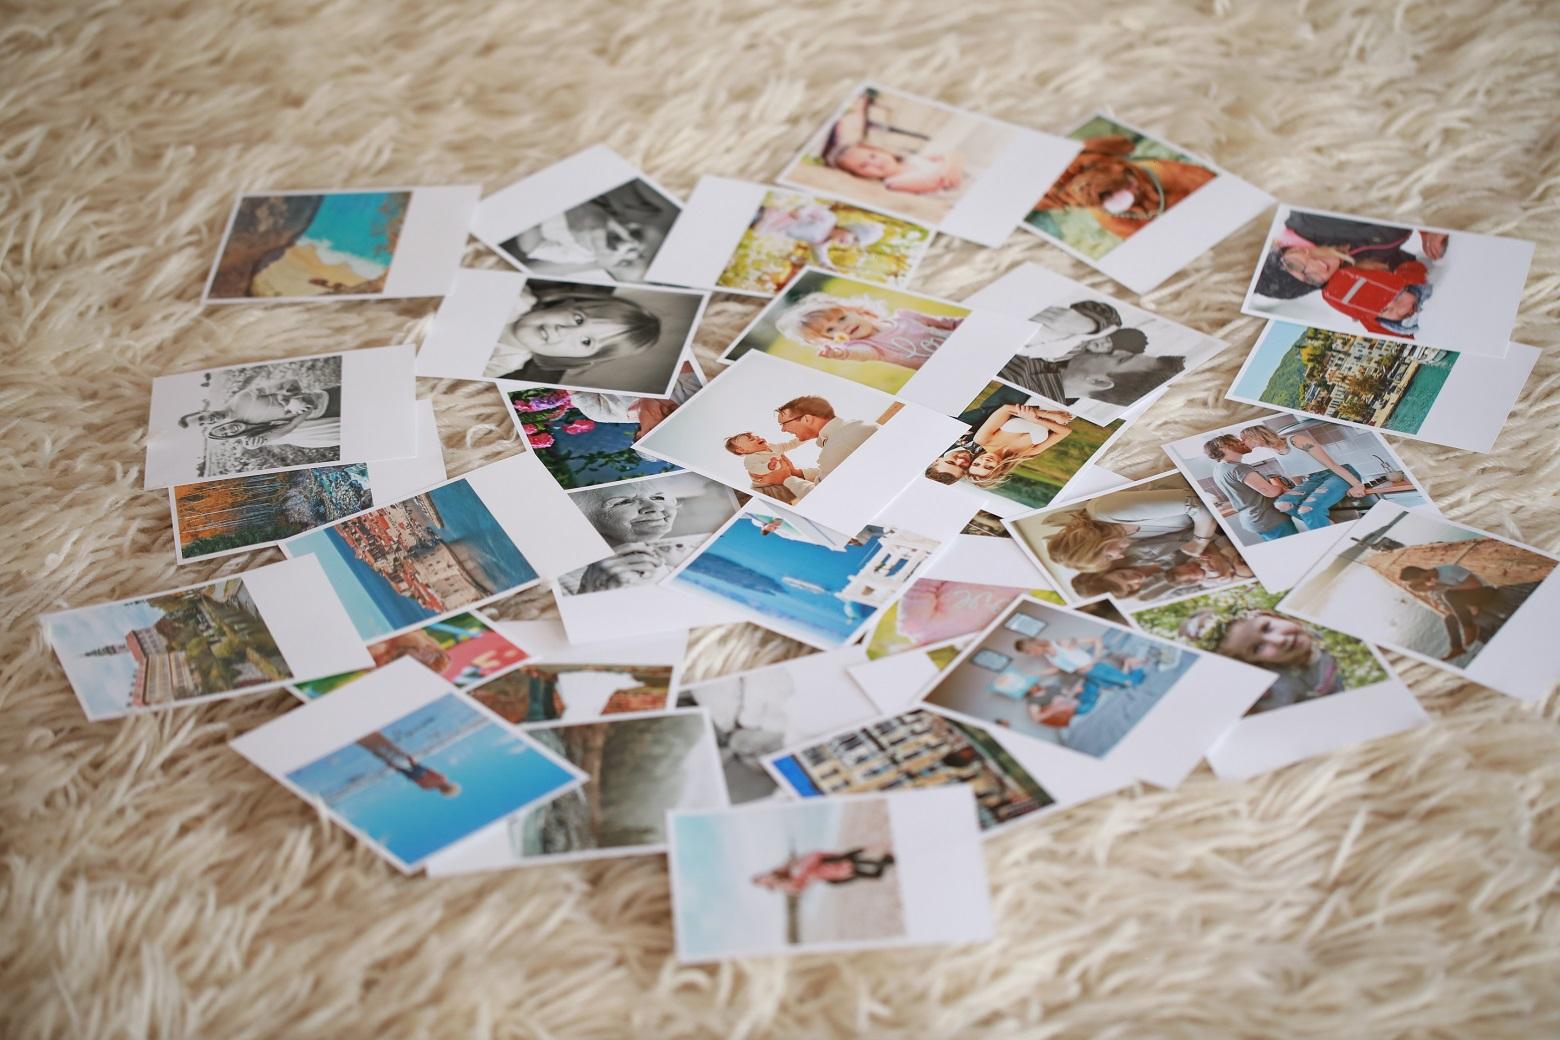 Bontia_Fotos (3).JPG